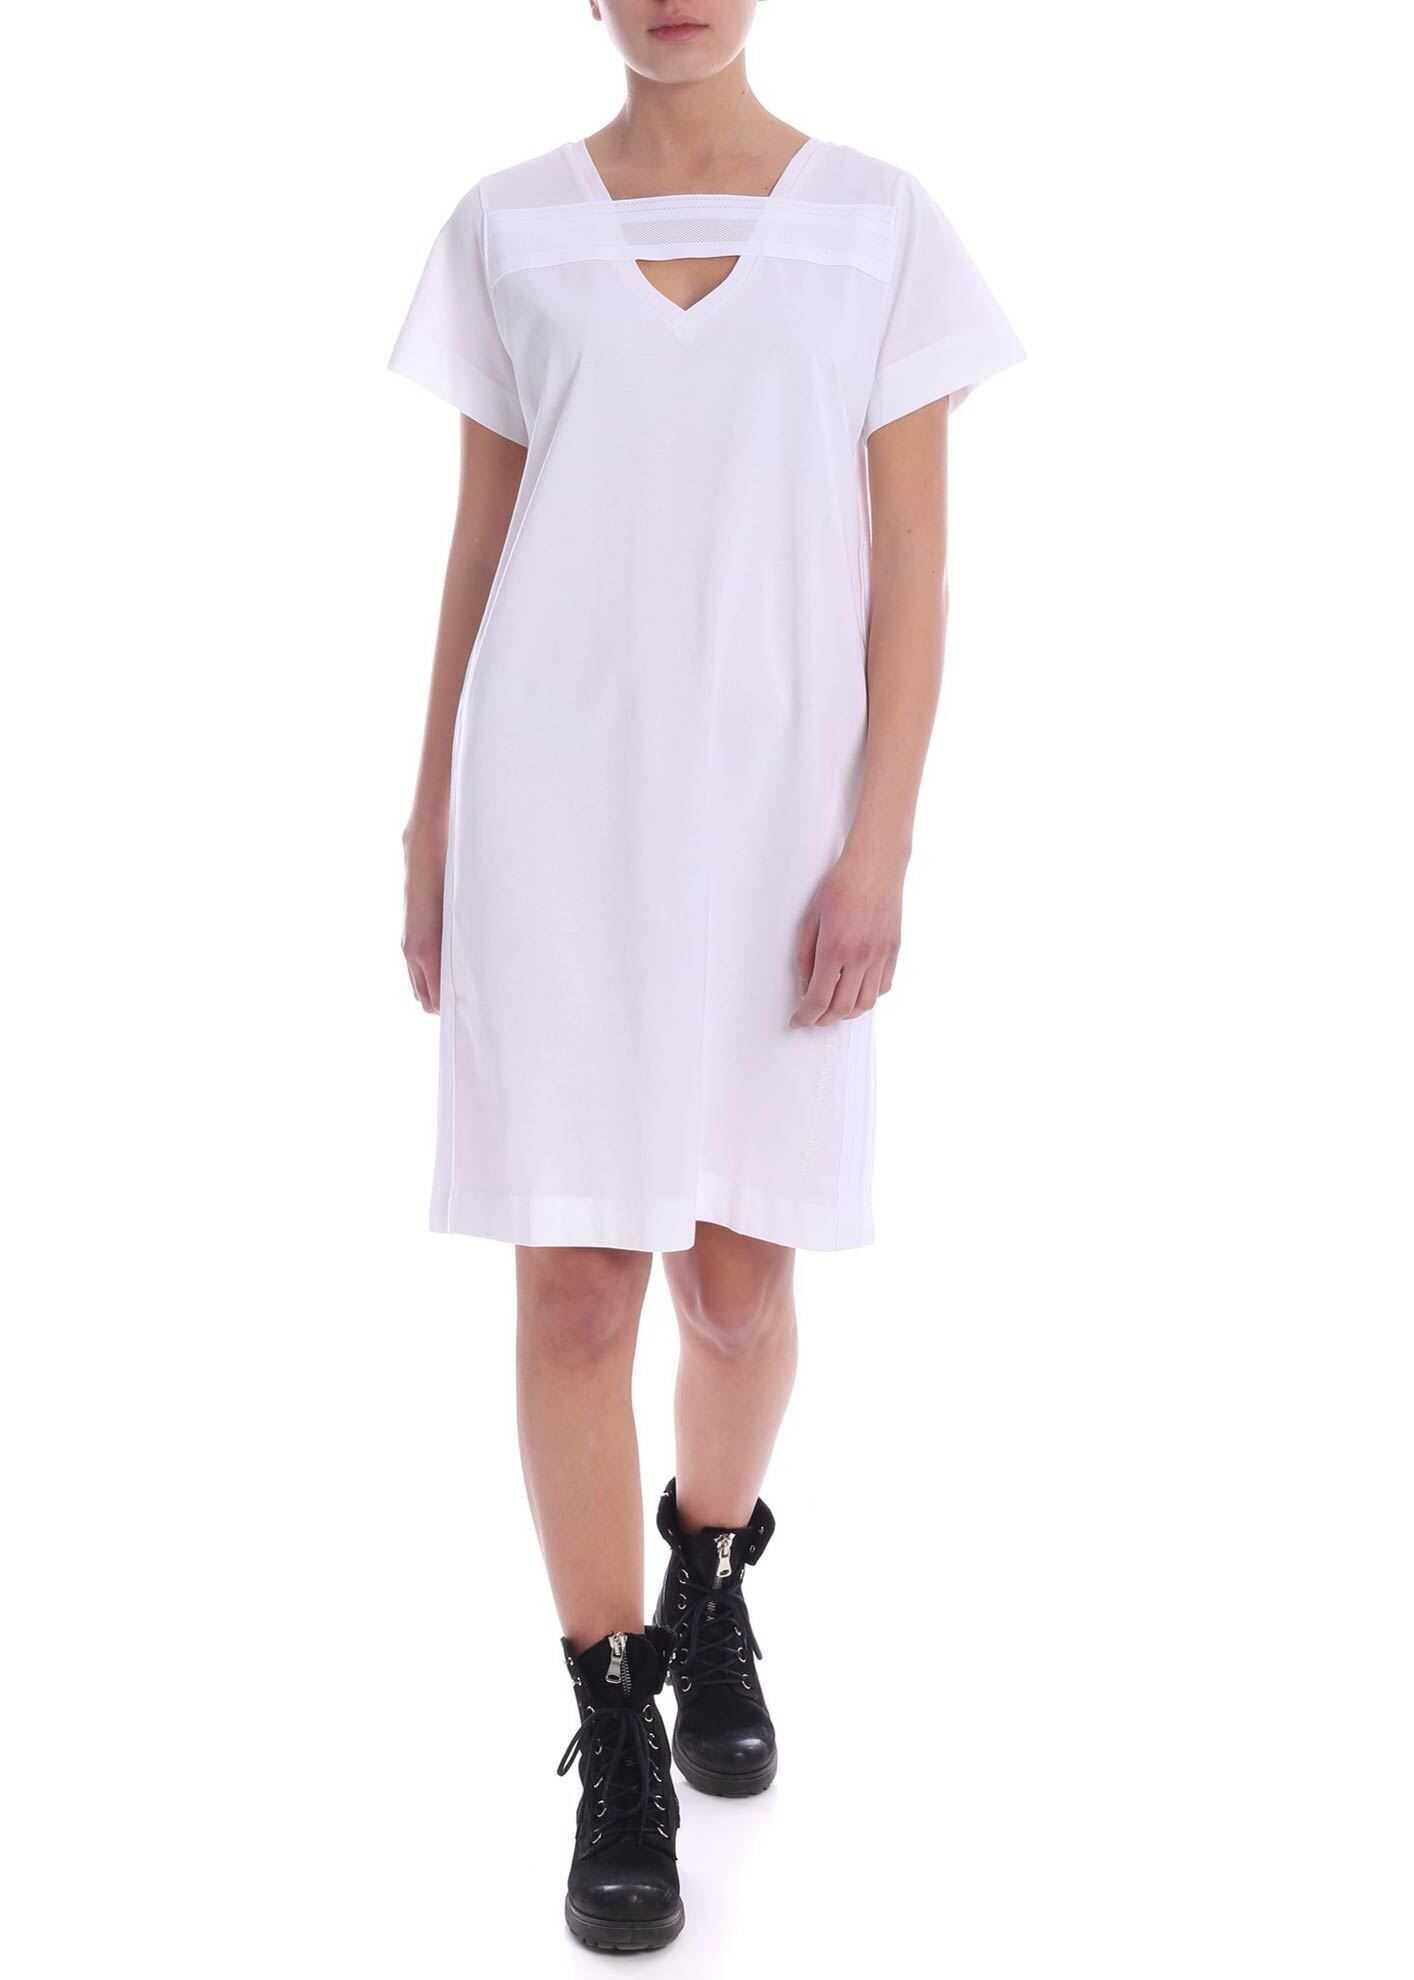 Diesel Stripe Dress In White White